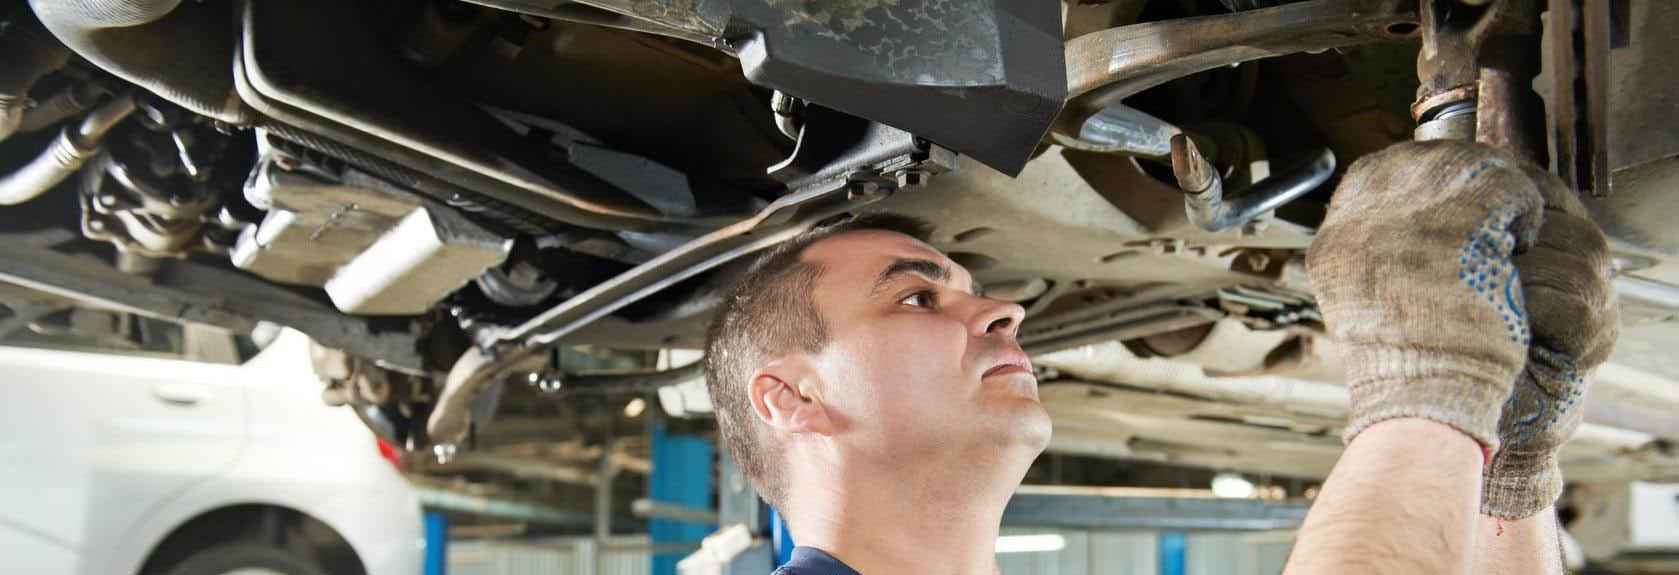 Mechanic working under car.